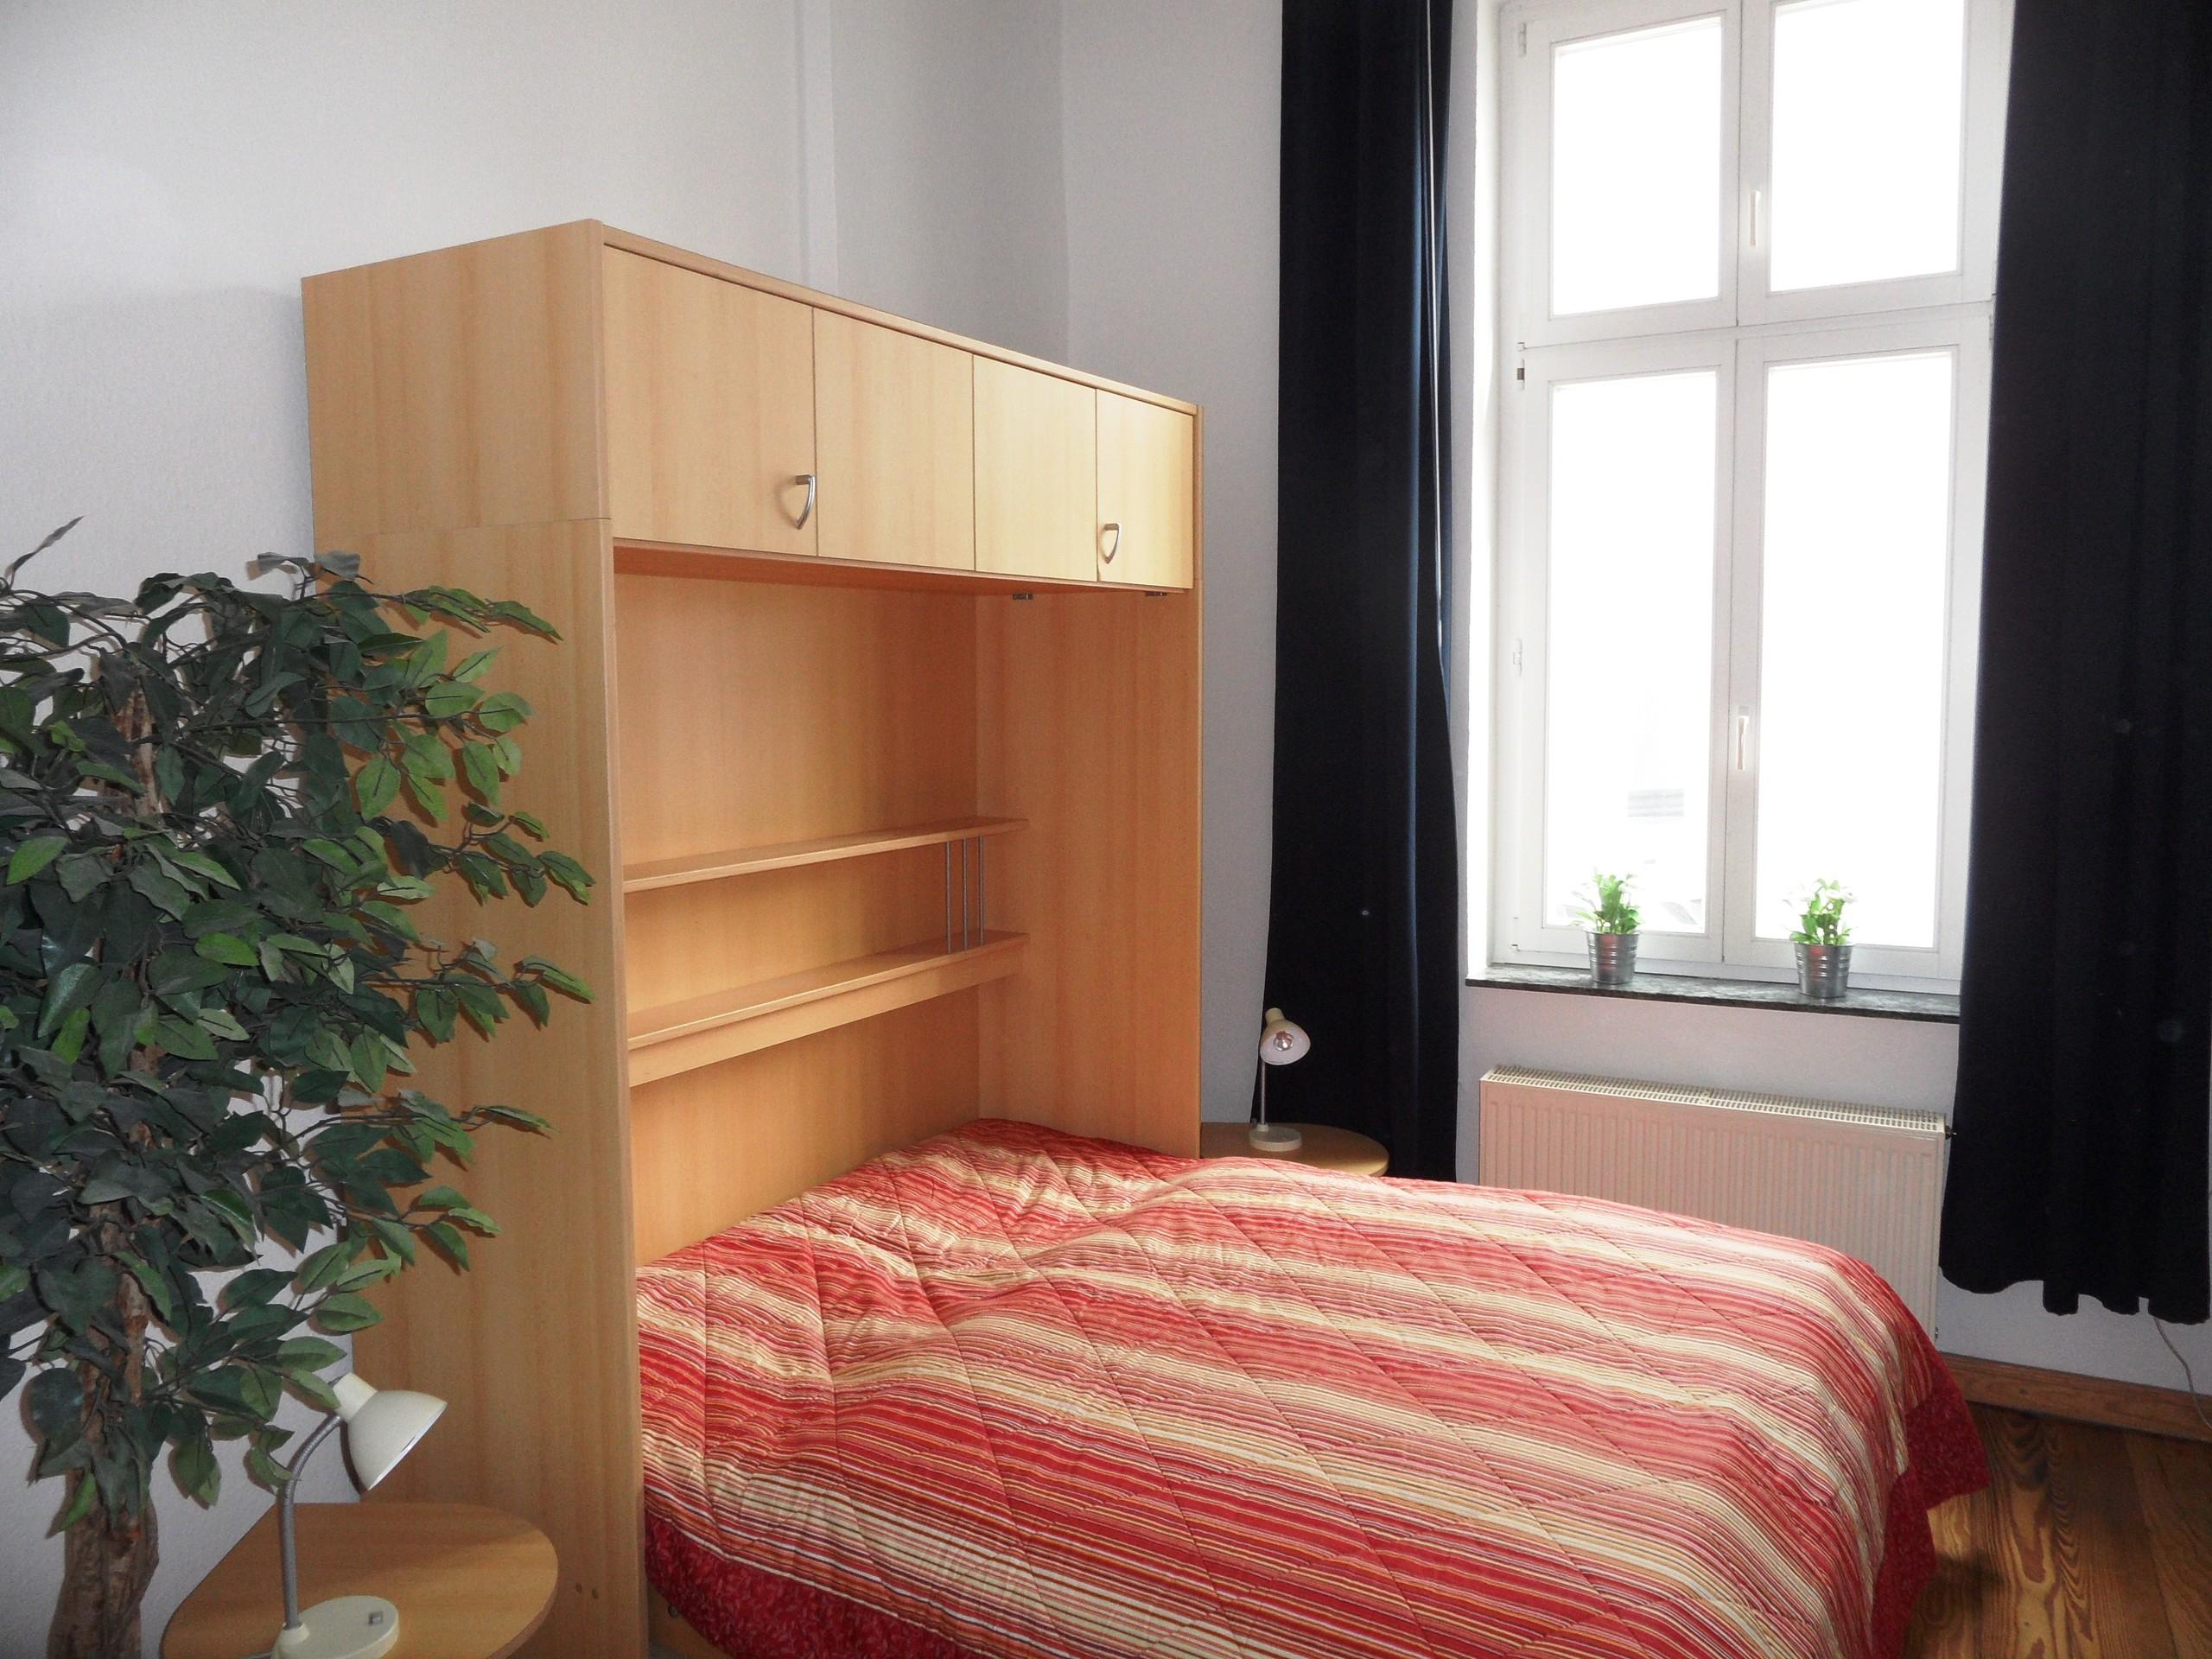 Schrankbett (Maße 180 x 200 cm)